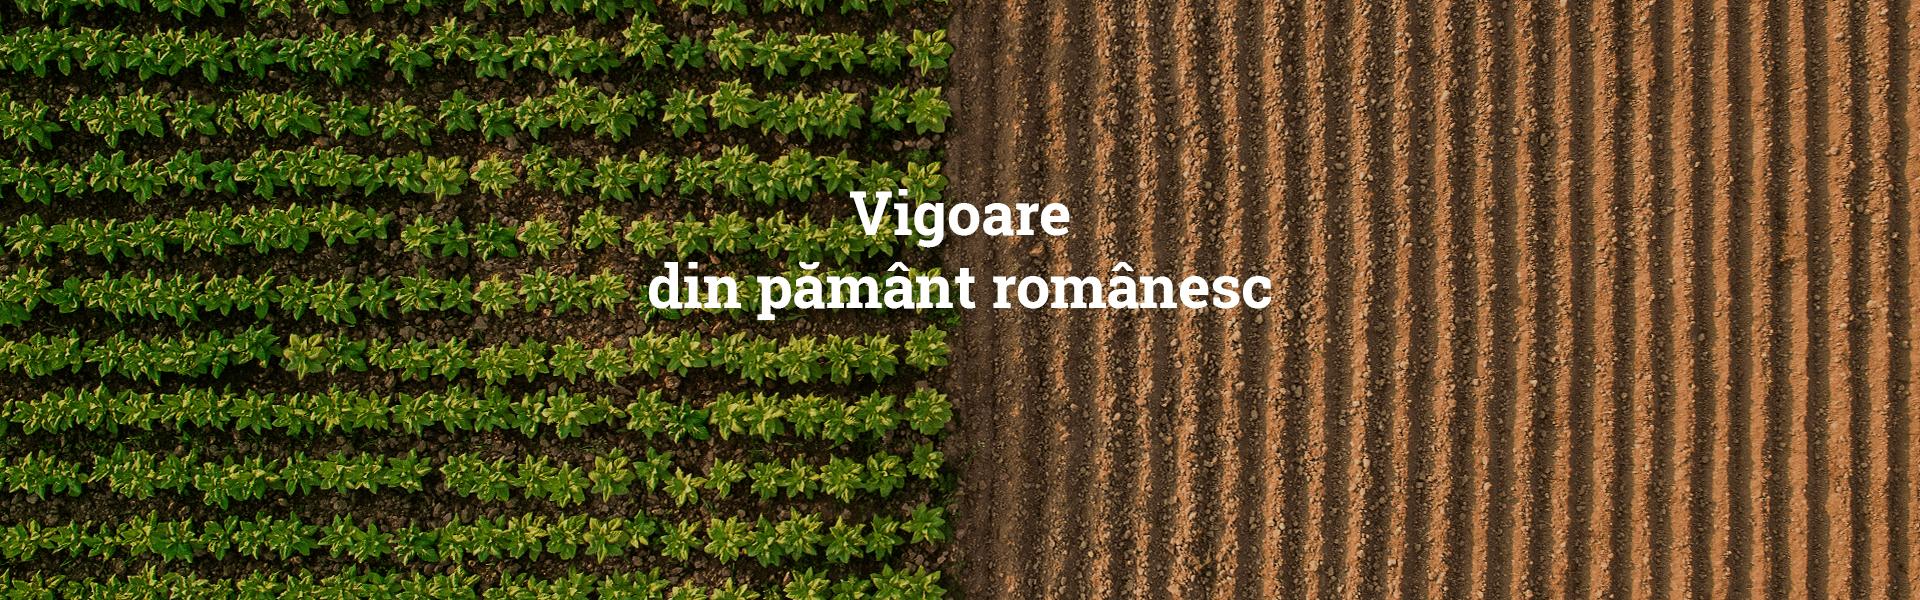 Vigoare din pământ românesc